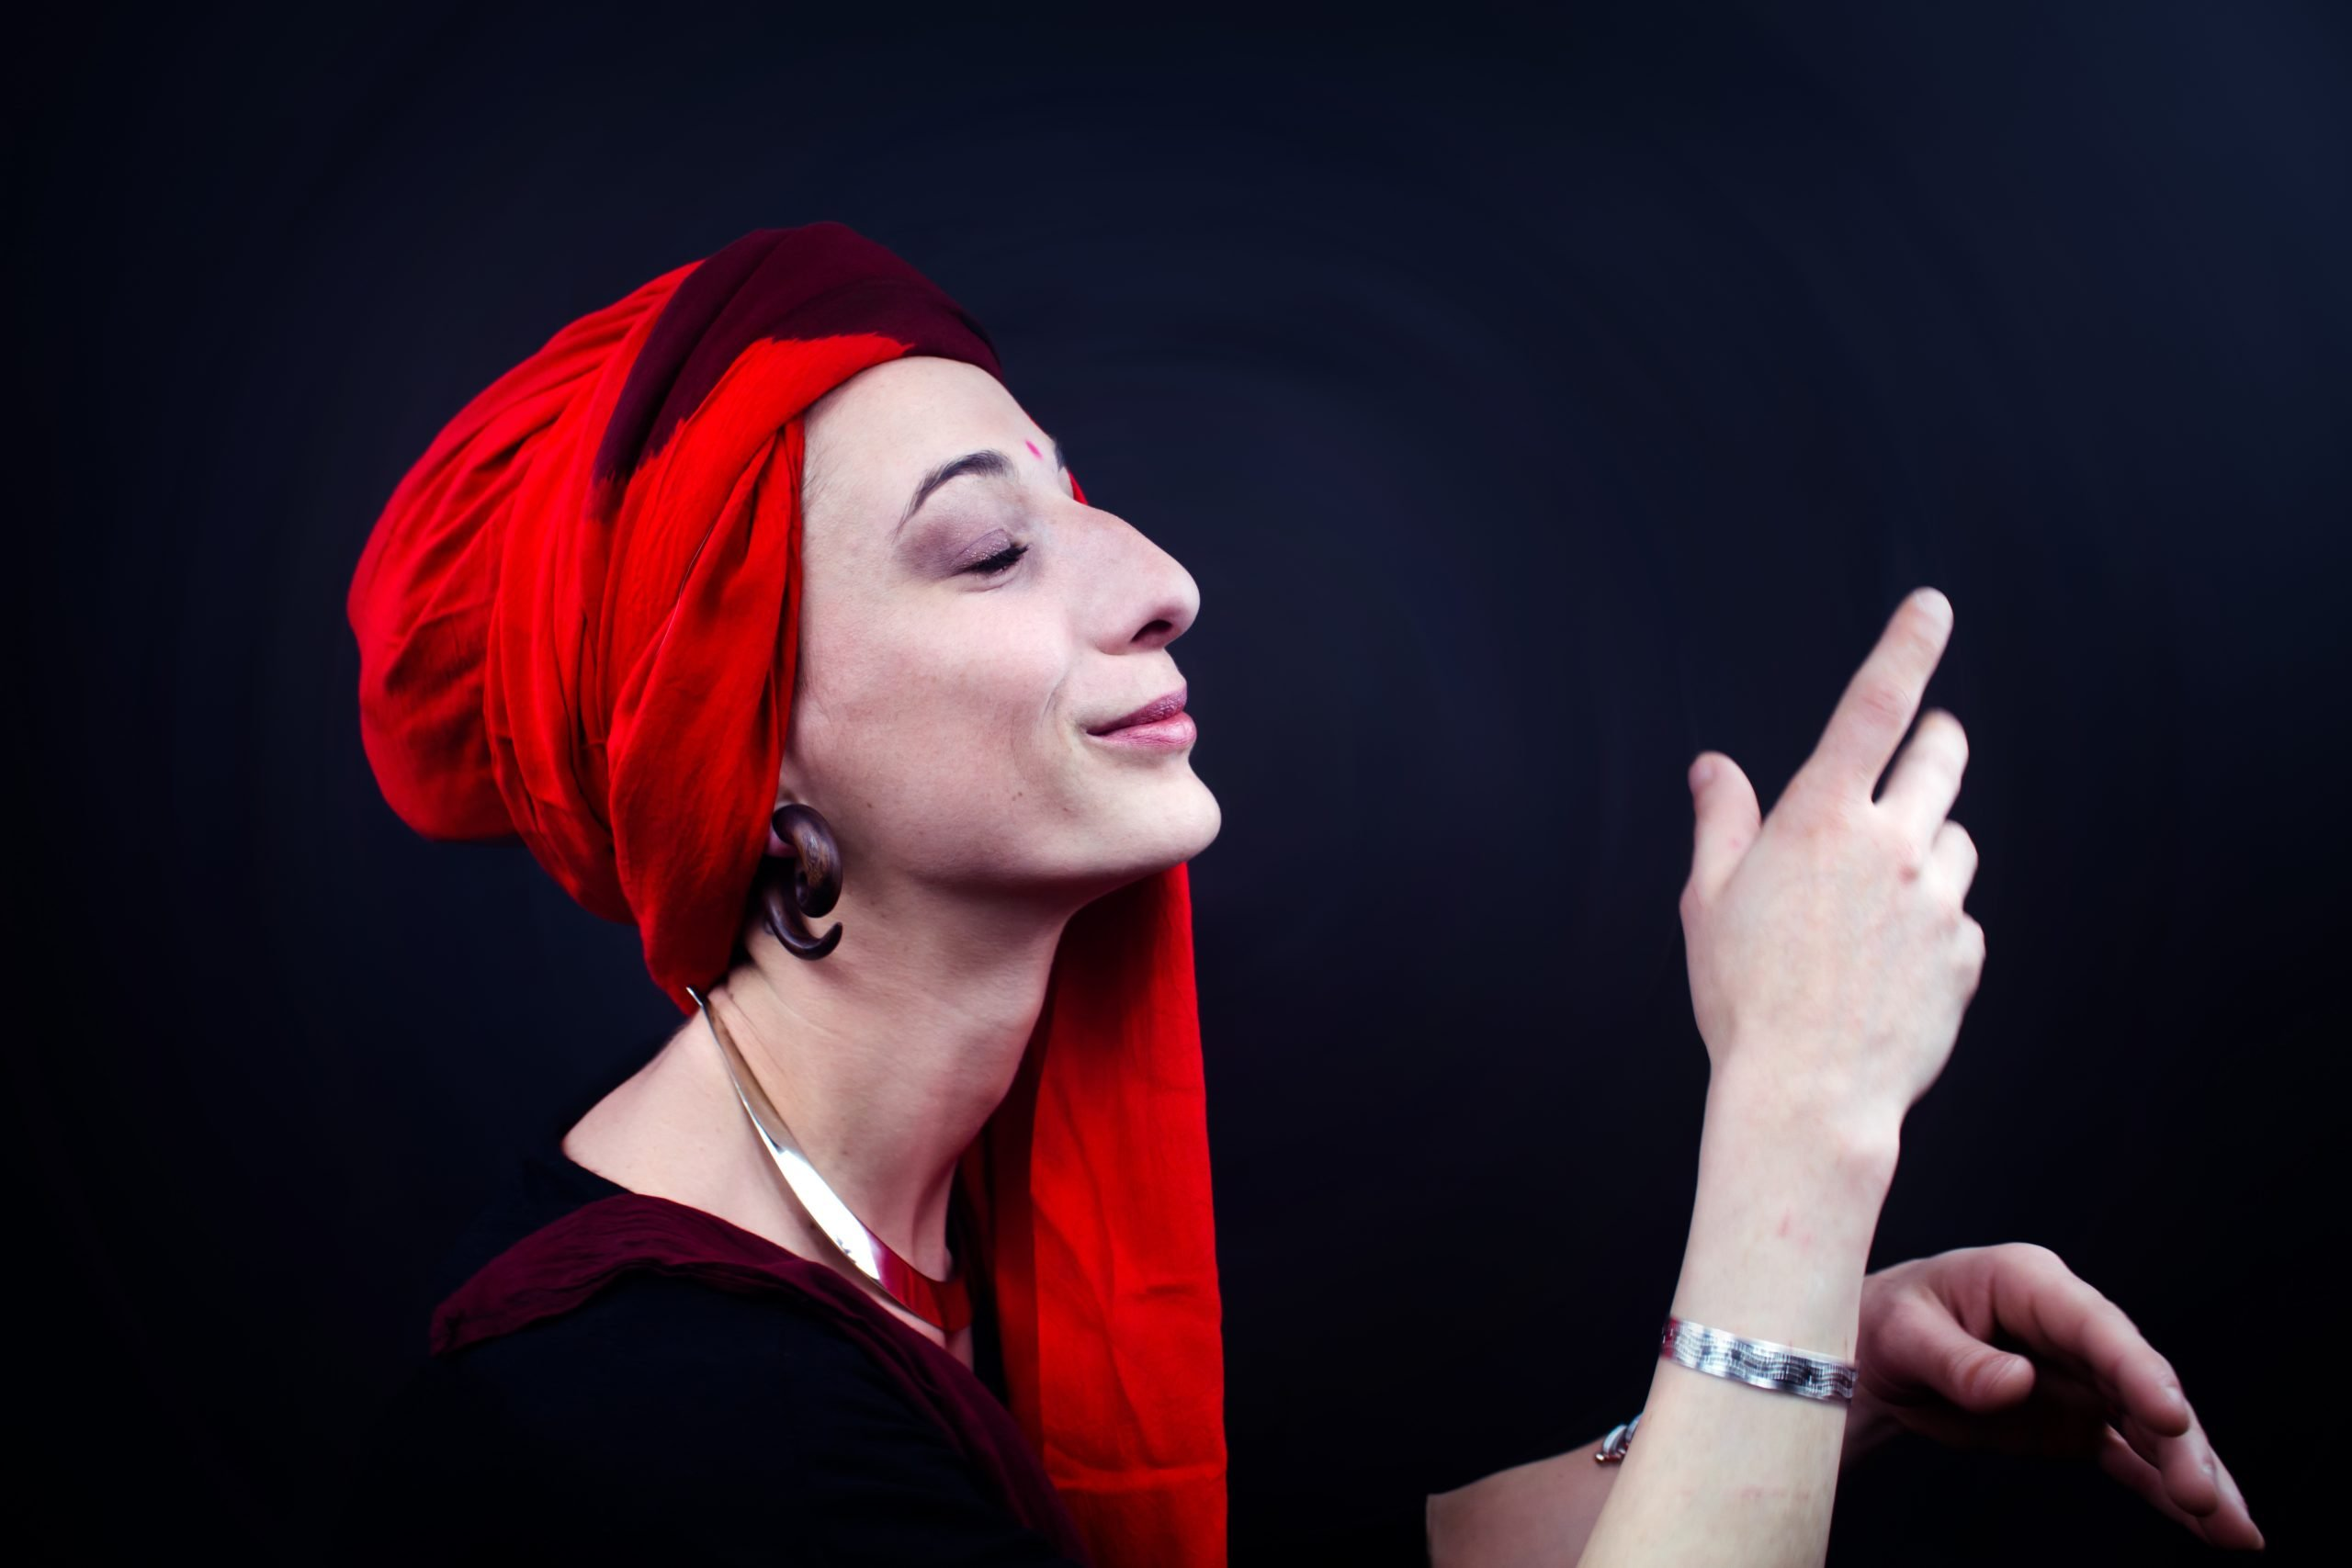 Chiara Battistini photographer